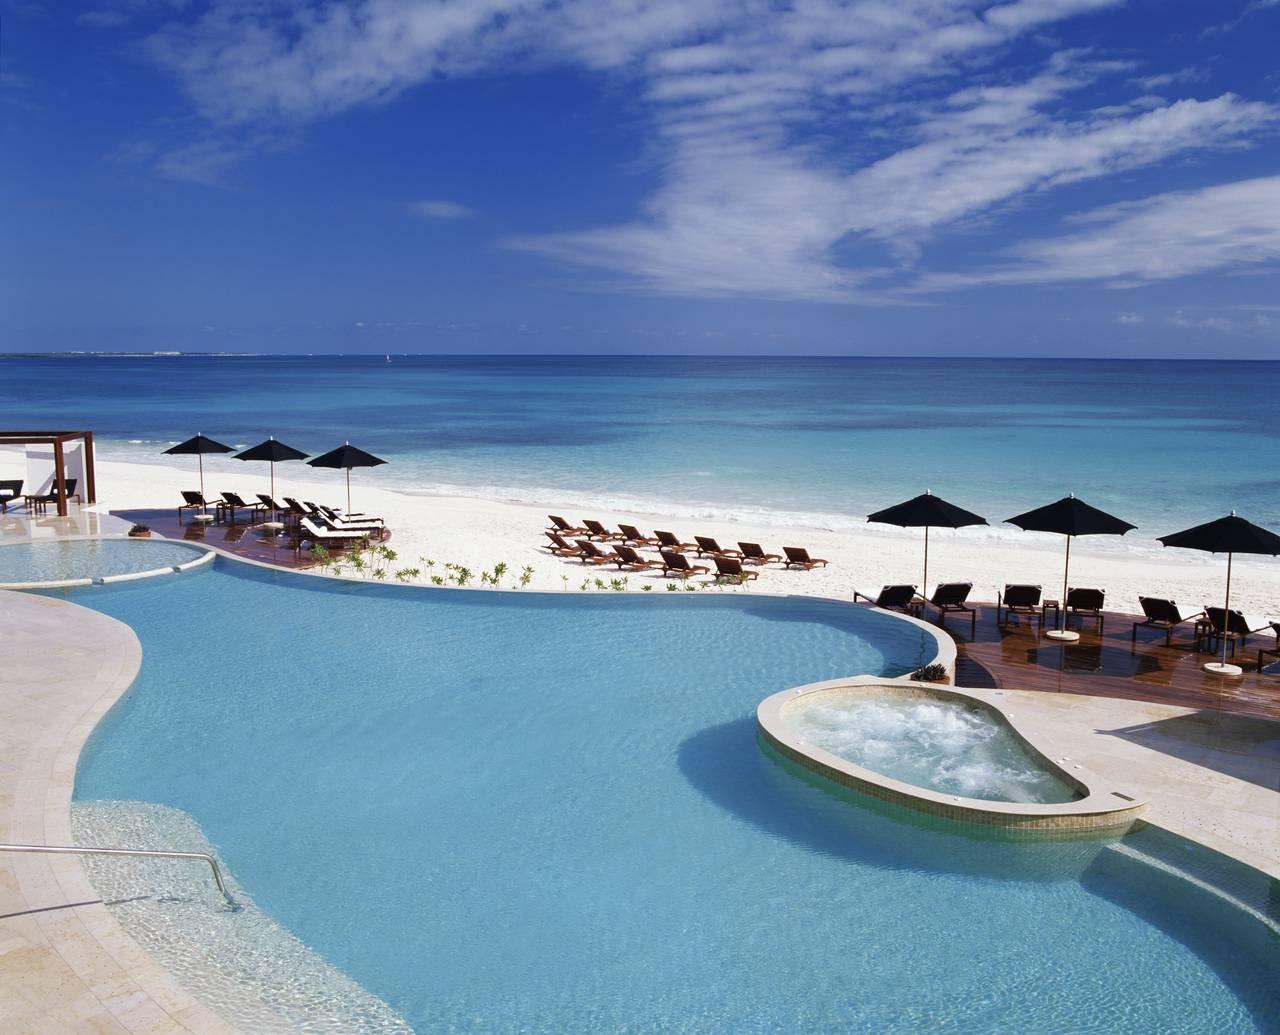 Rosewood Mayakoba Pool View : Photo © Mayakoba Resorts